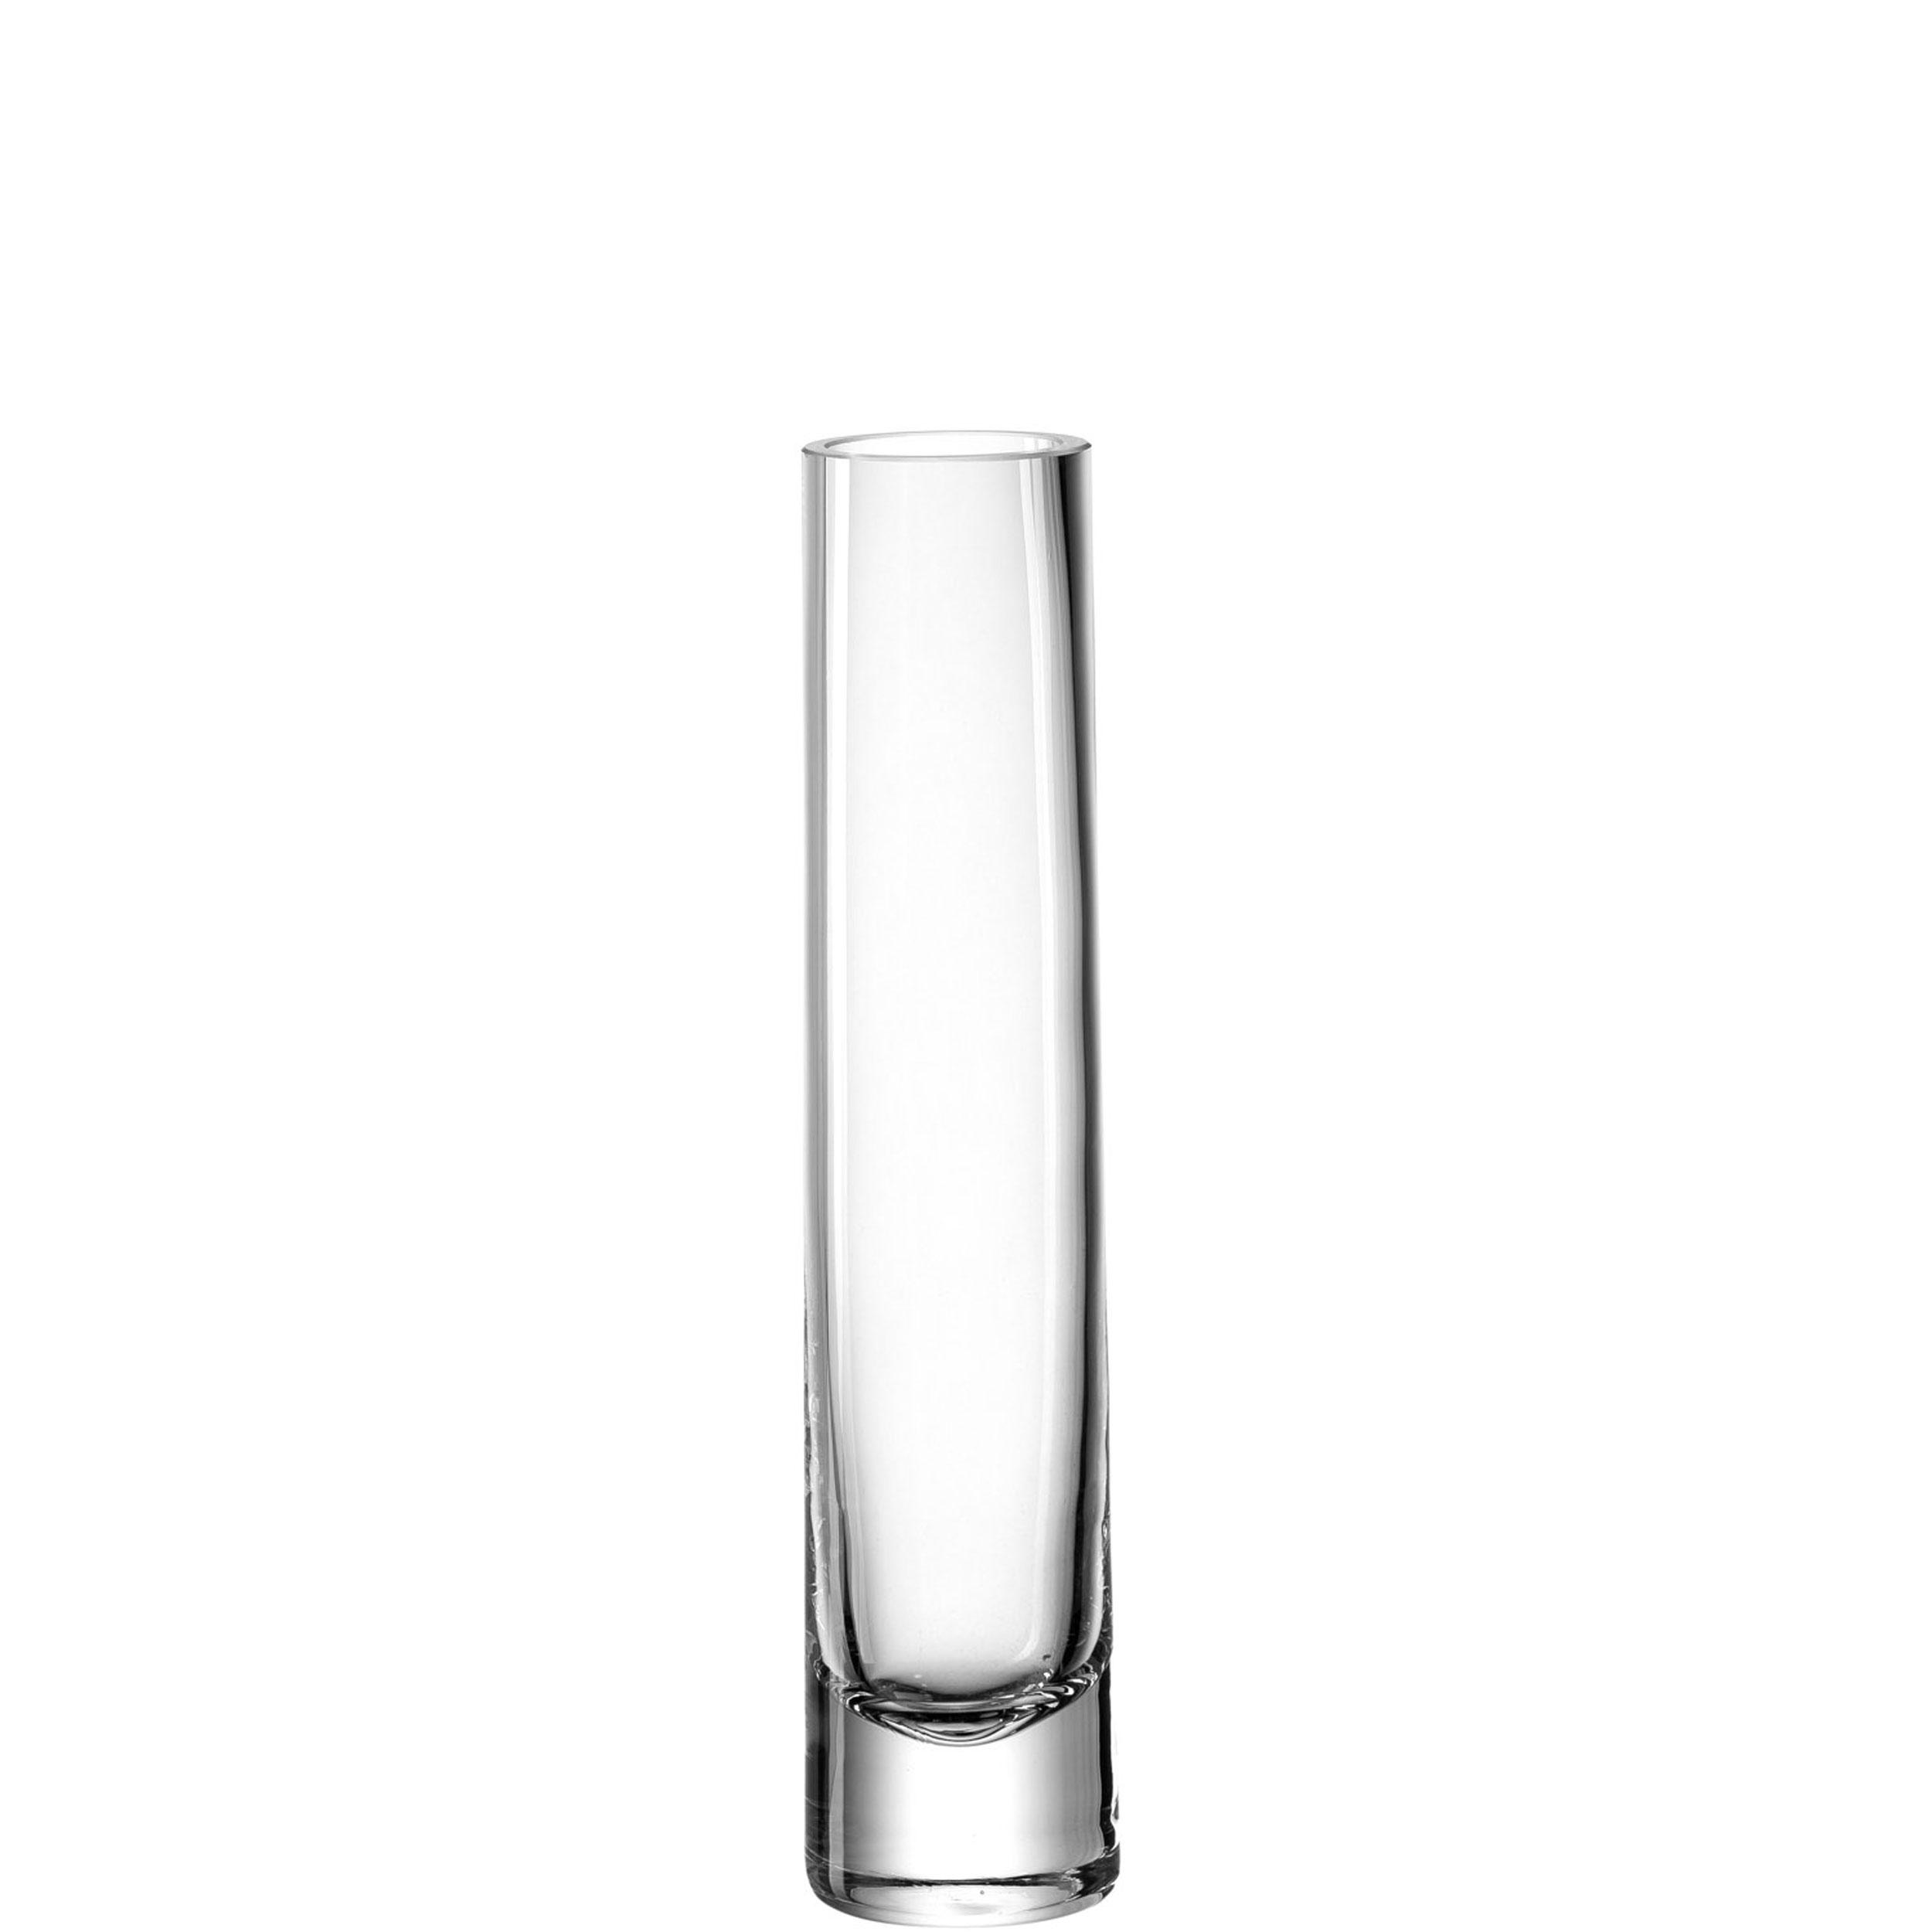 Leonardo Solifleurvase CASOLARE Vase Glasvase Dekovase Kalk-Natron Glas 18 cm